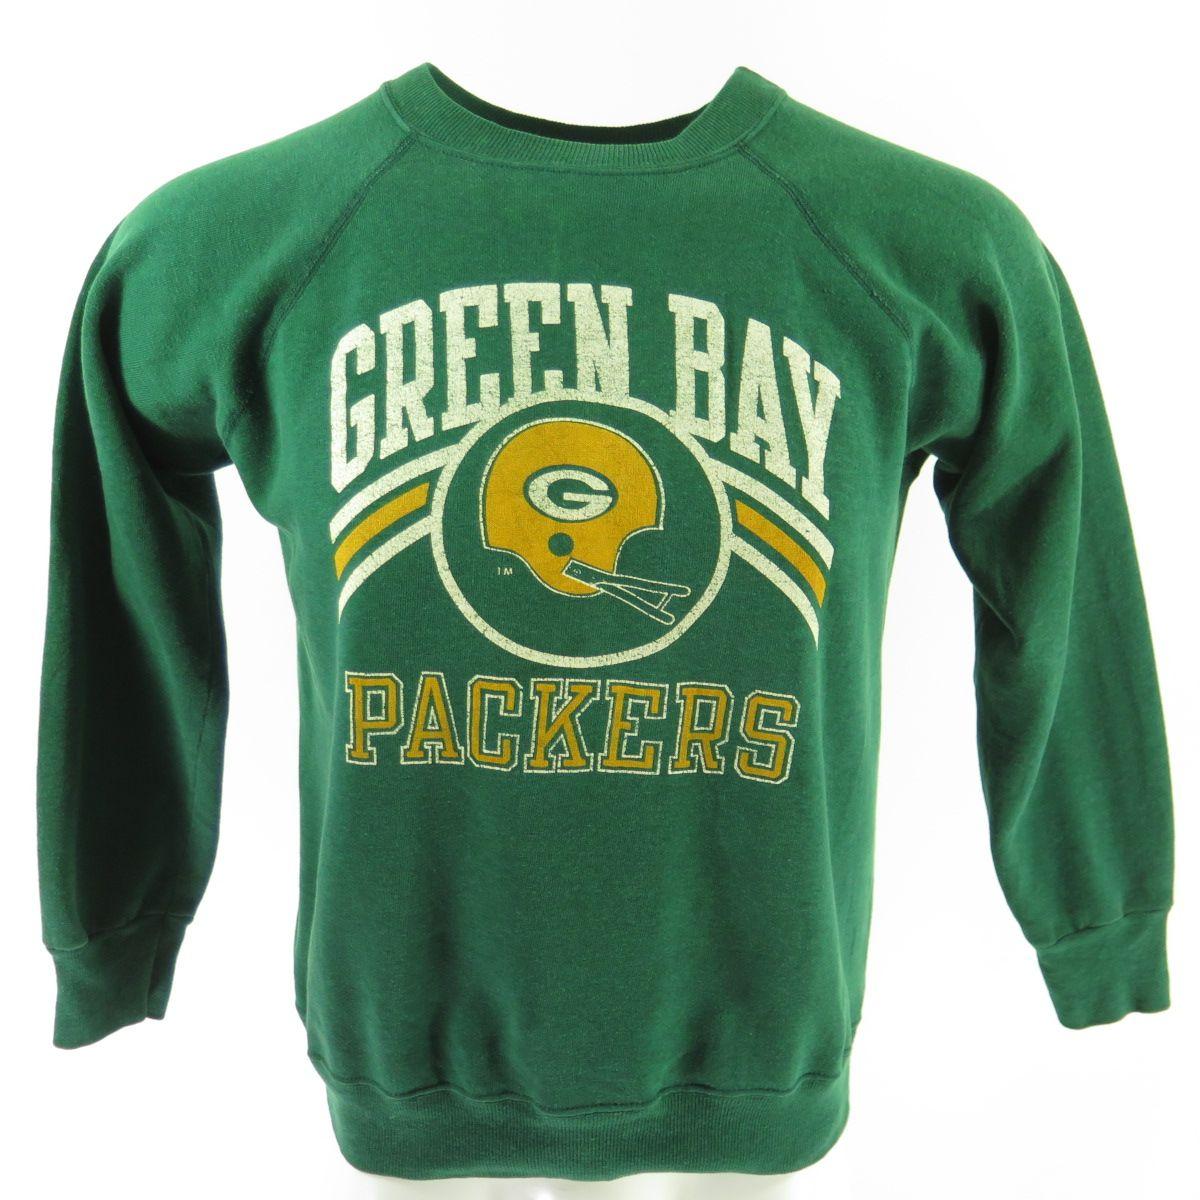 Vintage 80s Green Bay Packers Champion Sweatshirt Mens L Nfl Football Green Usa The Clothing Vault Champion Sweatshirt Vintage Sports Clothing Sweatshirts [ 1200 x 1200 Pixel ]